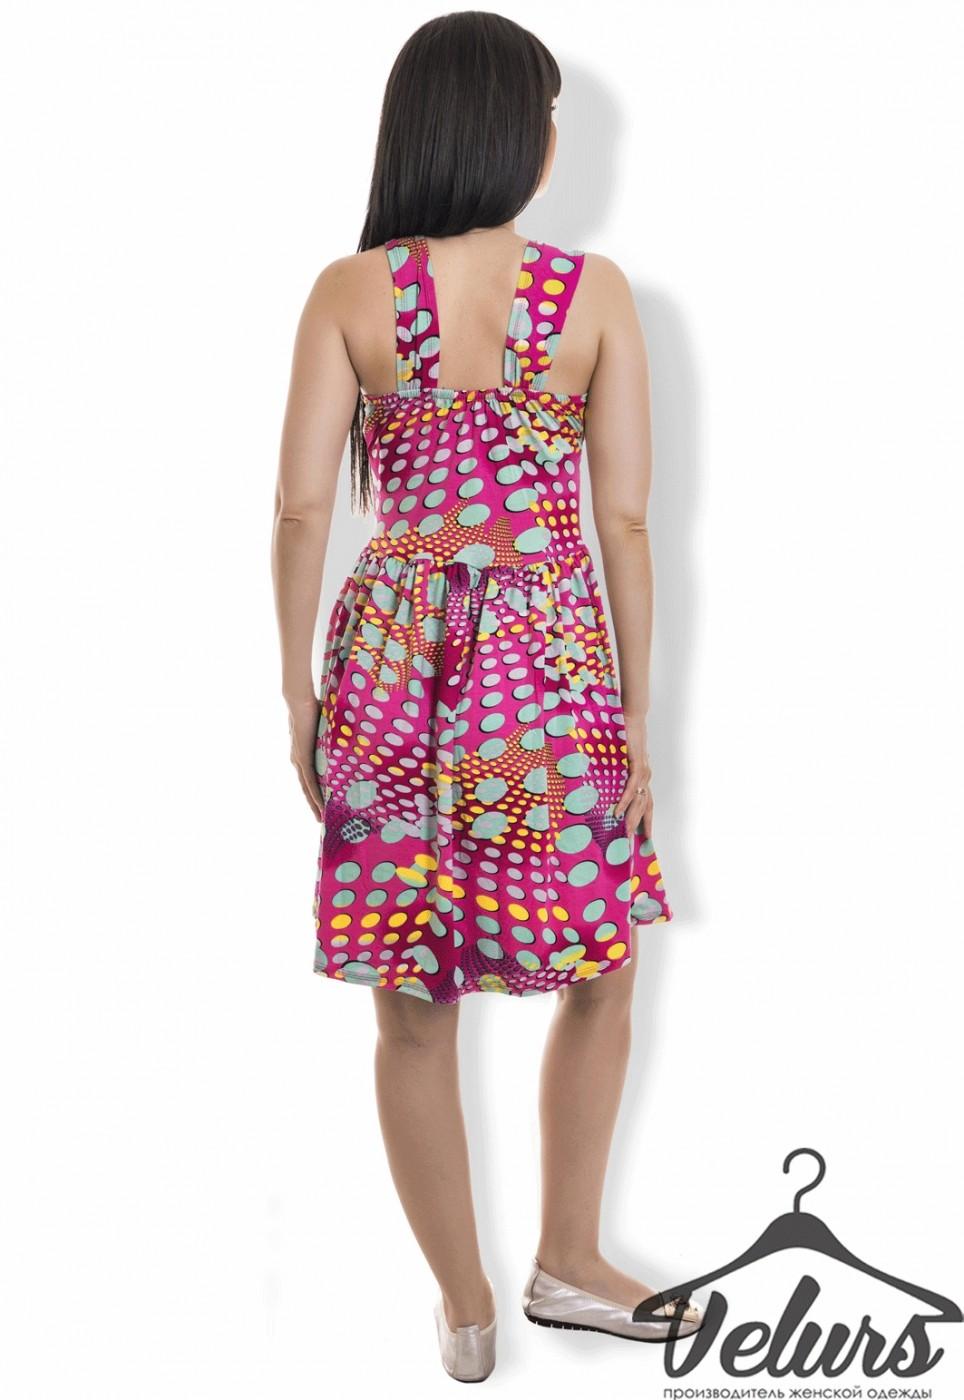 Velurs: Платье 21962 - фото 6